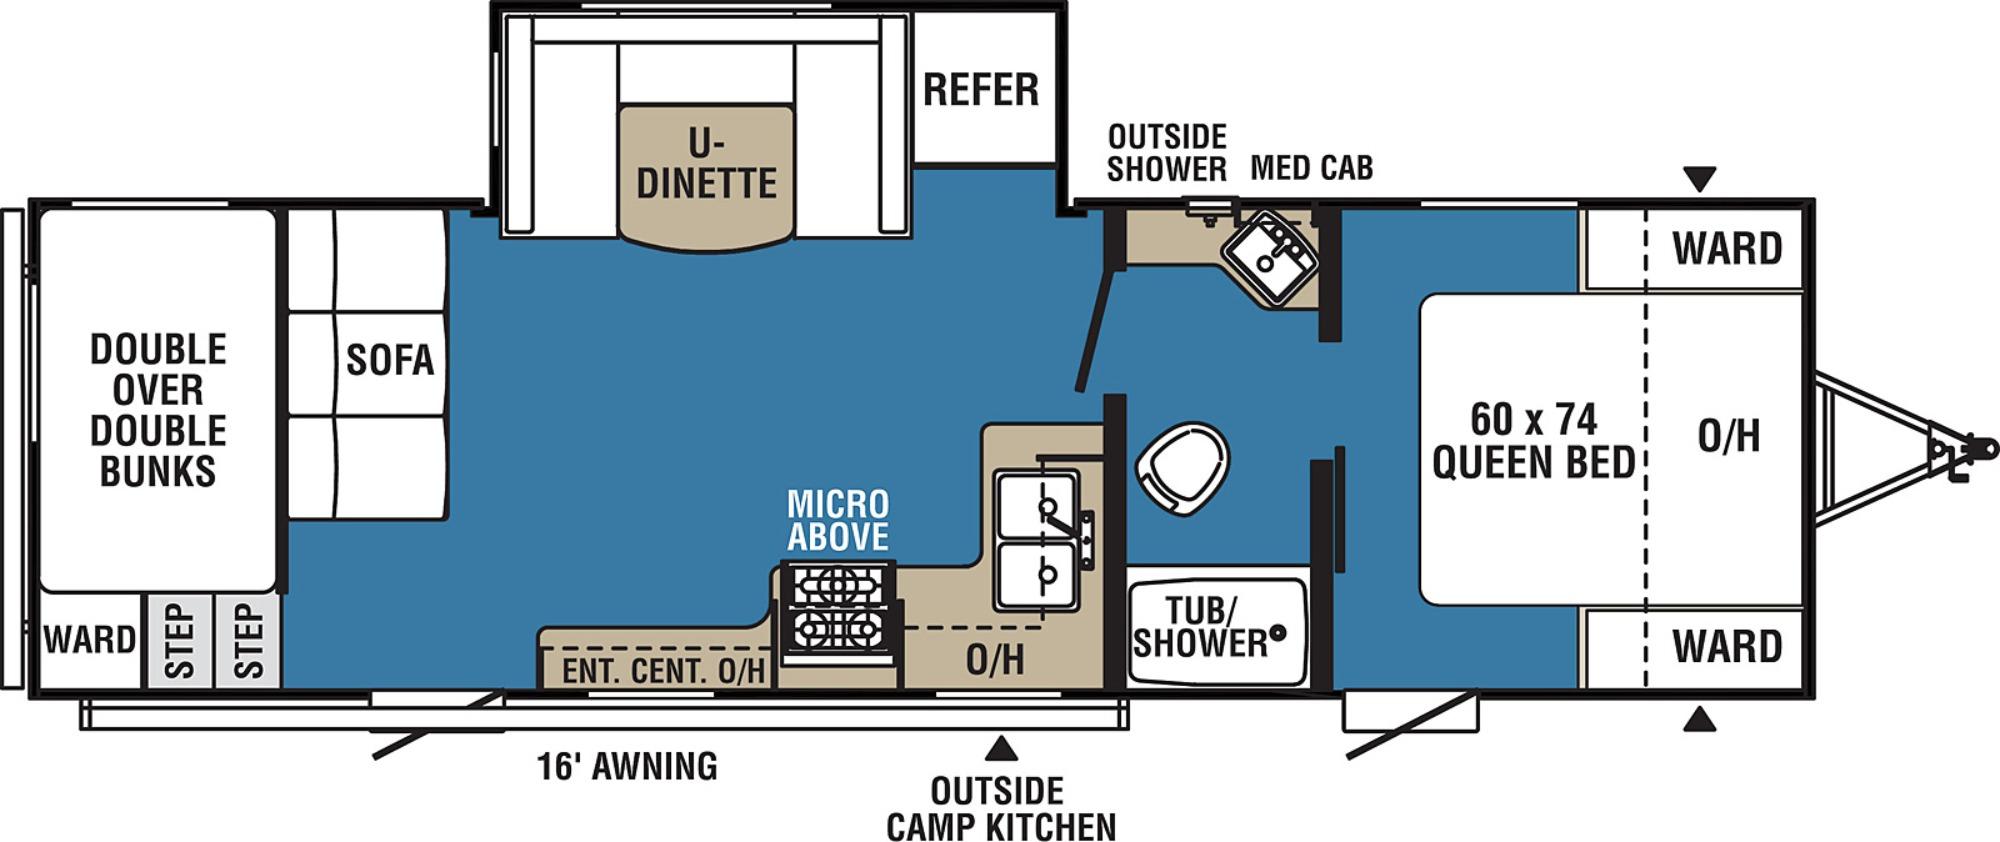 View Floor Plan for 2021 COACHMEN VIKING ULTRA-LITE 262BHS